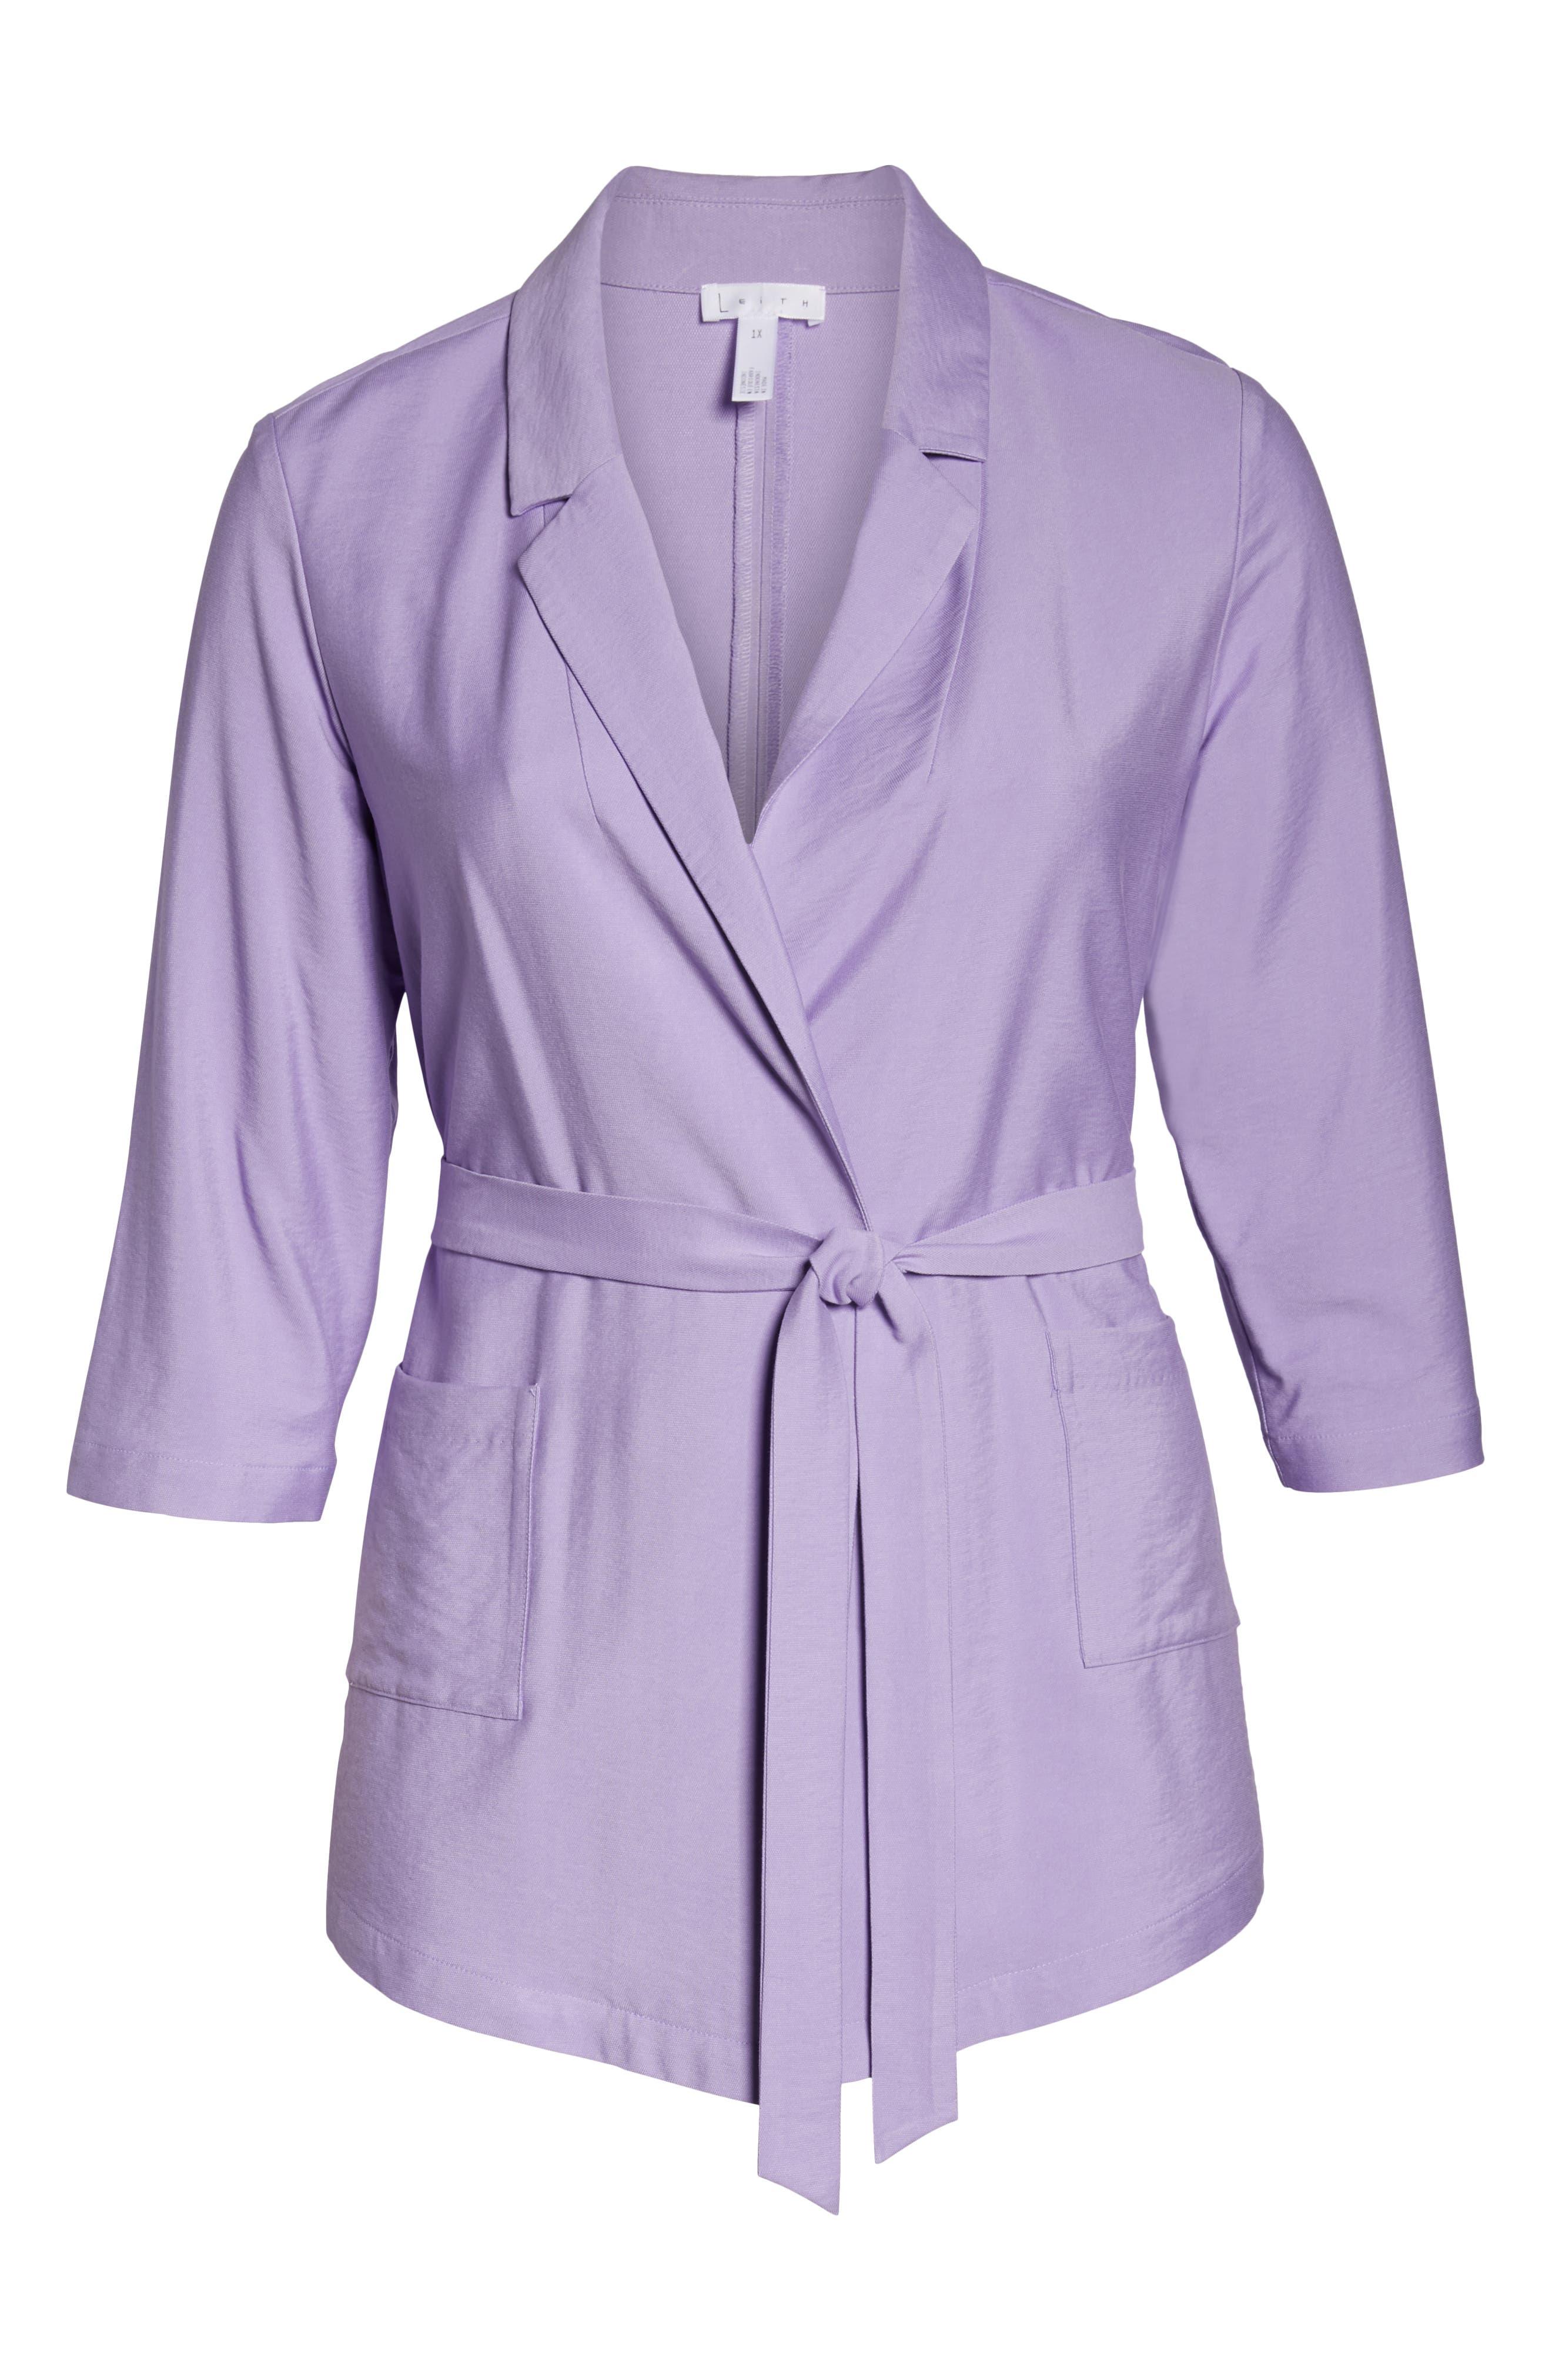 Belted Jacket,                             Alternate thumbnail 12, color,                             PURPLE BONNET